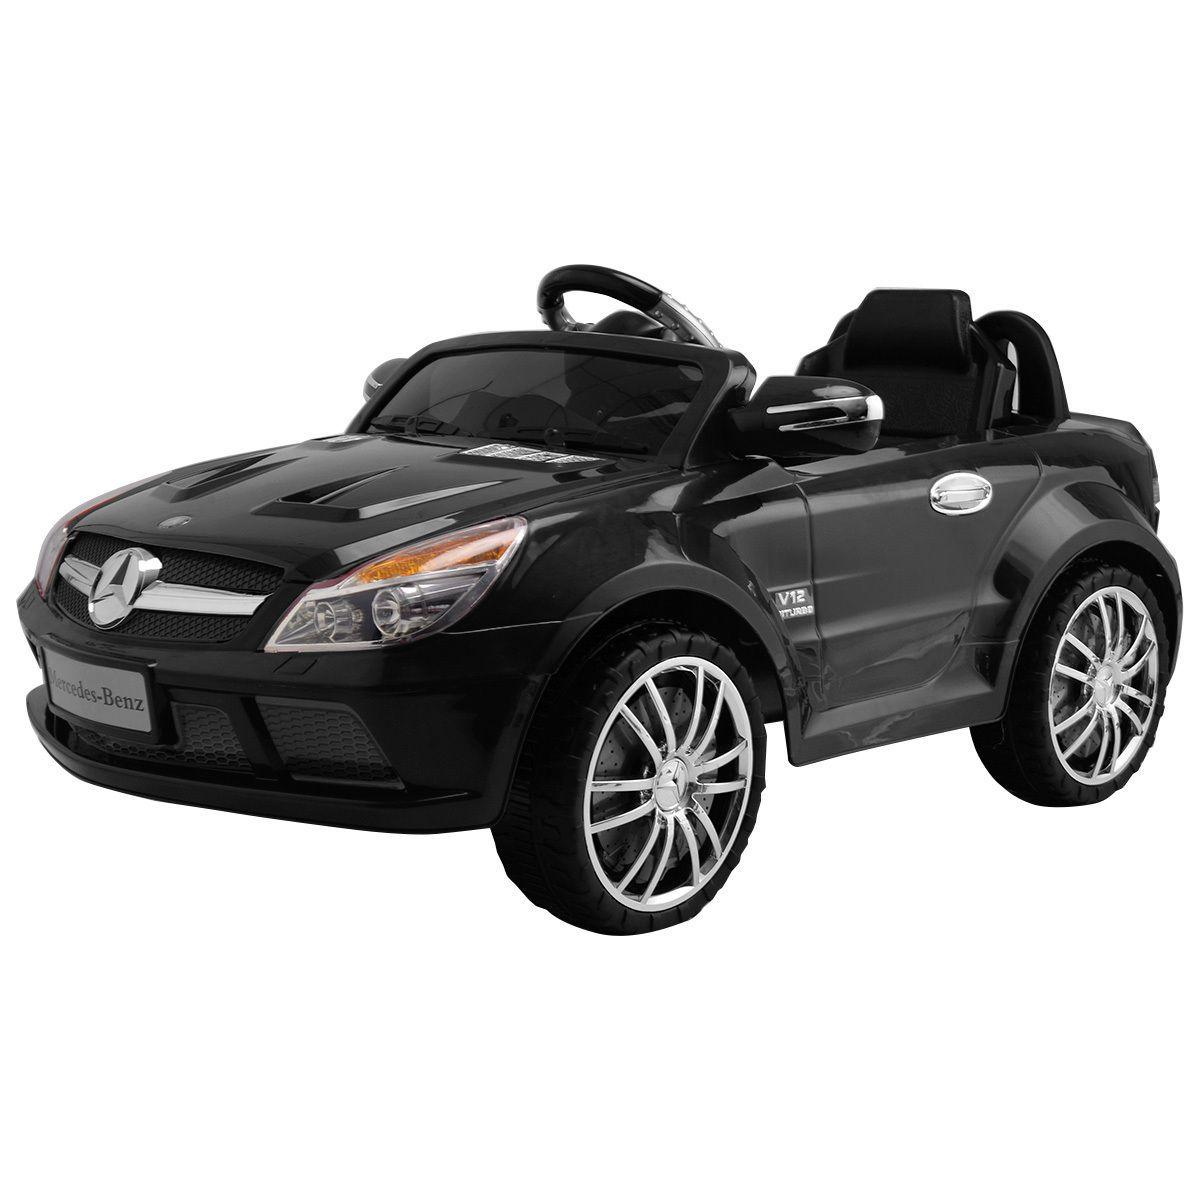 12V Mercedes Benz SL65 Electric Kids Ride On Car Music RC Remote Control